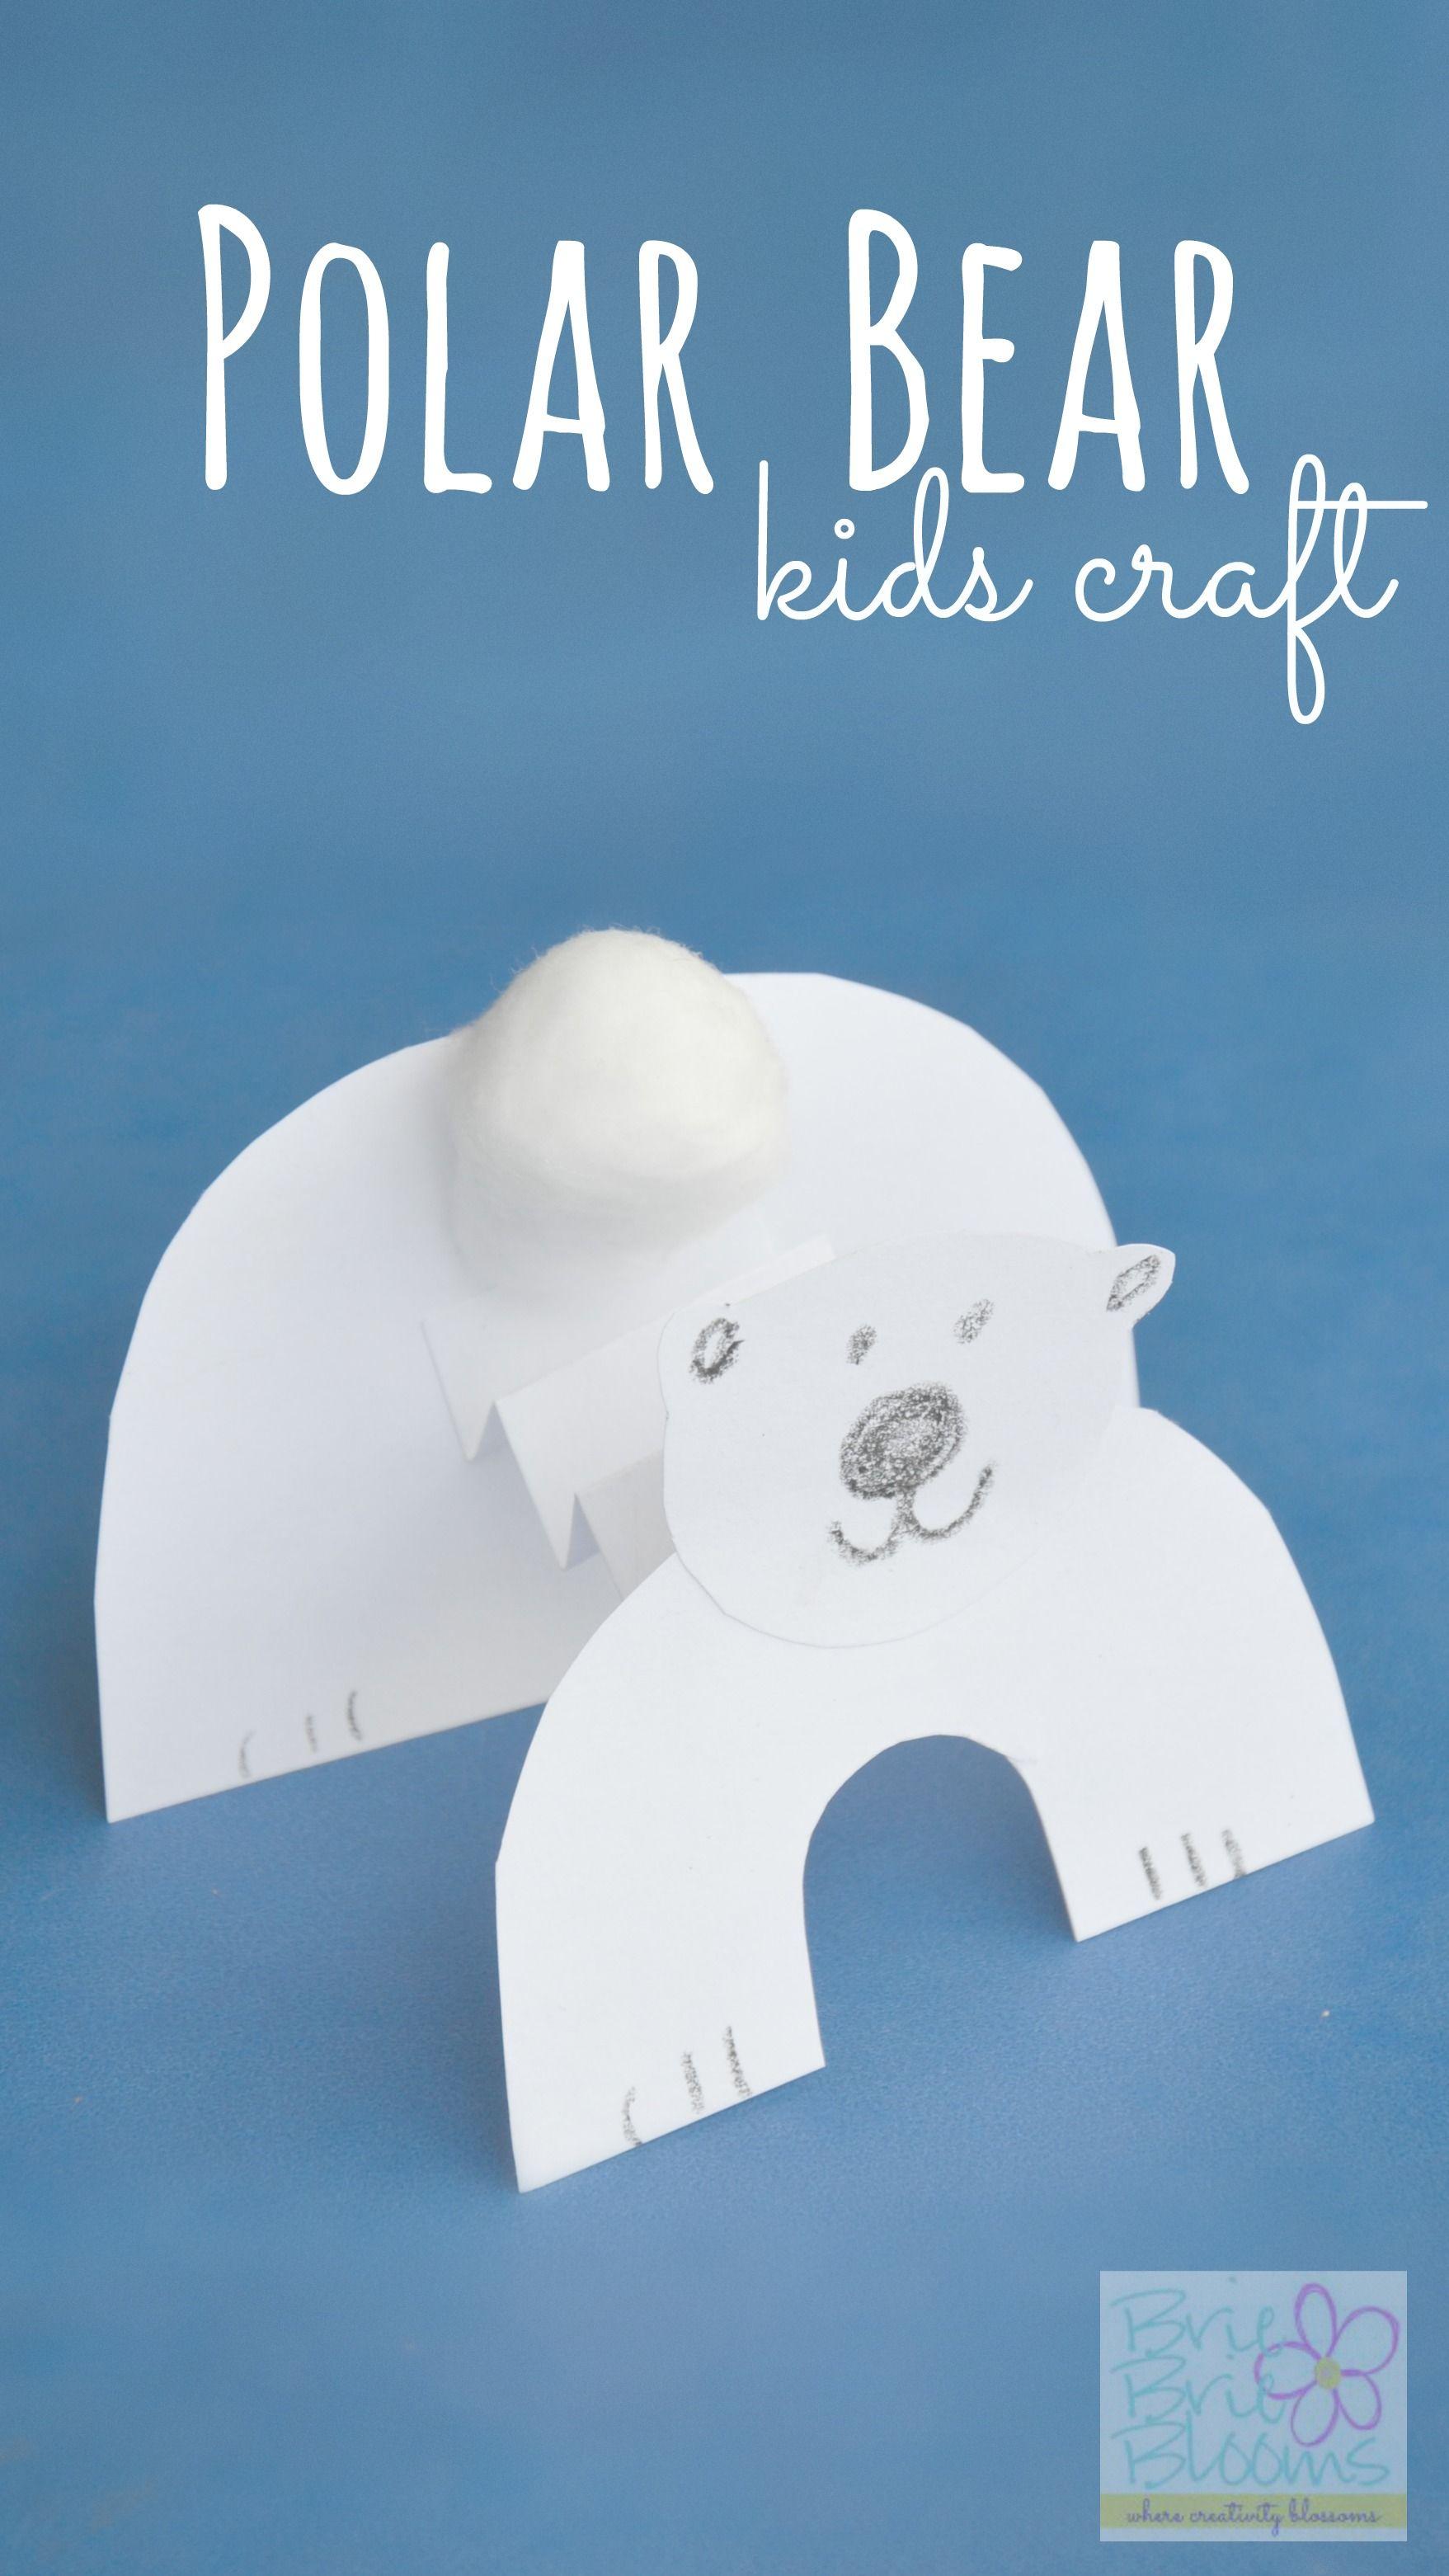 Polar Bear Kids Craft To Celebrate International Polar